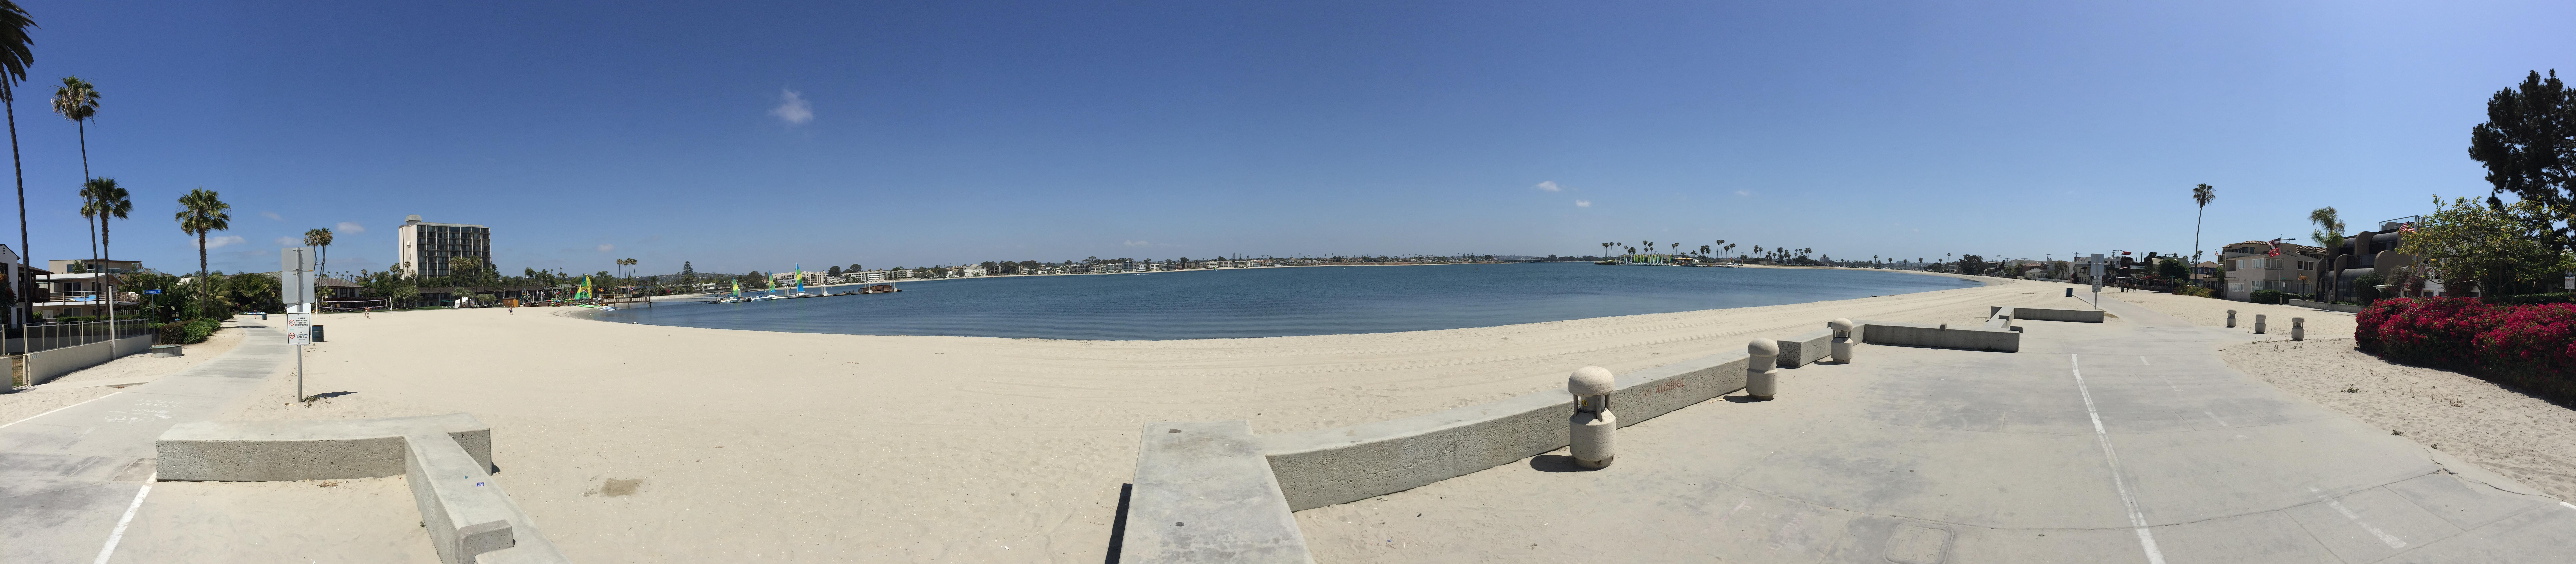 Mission Beach, CA